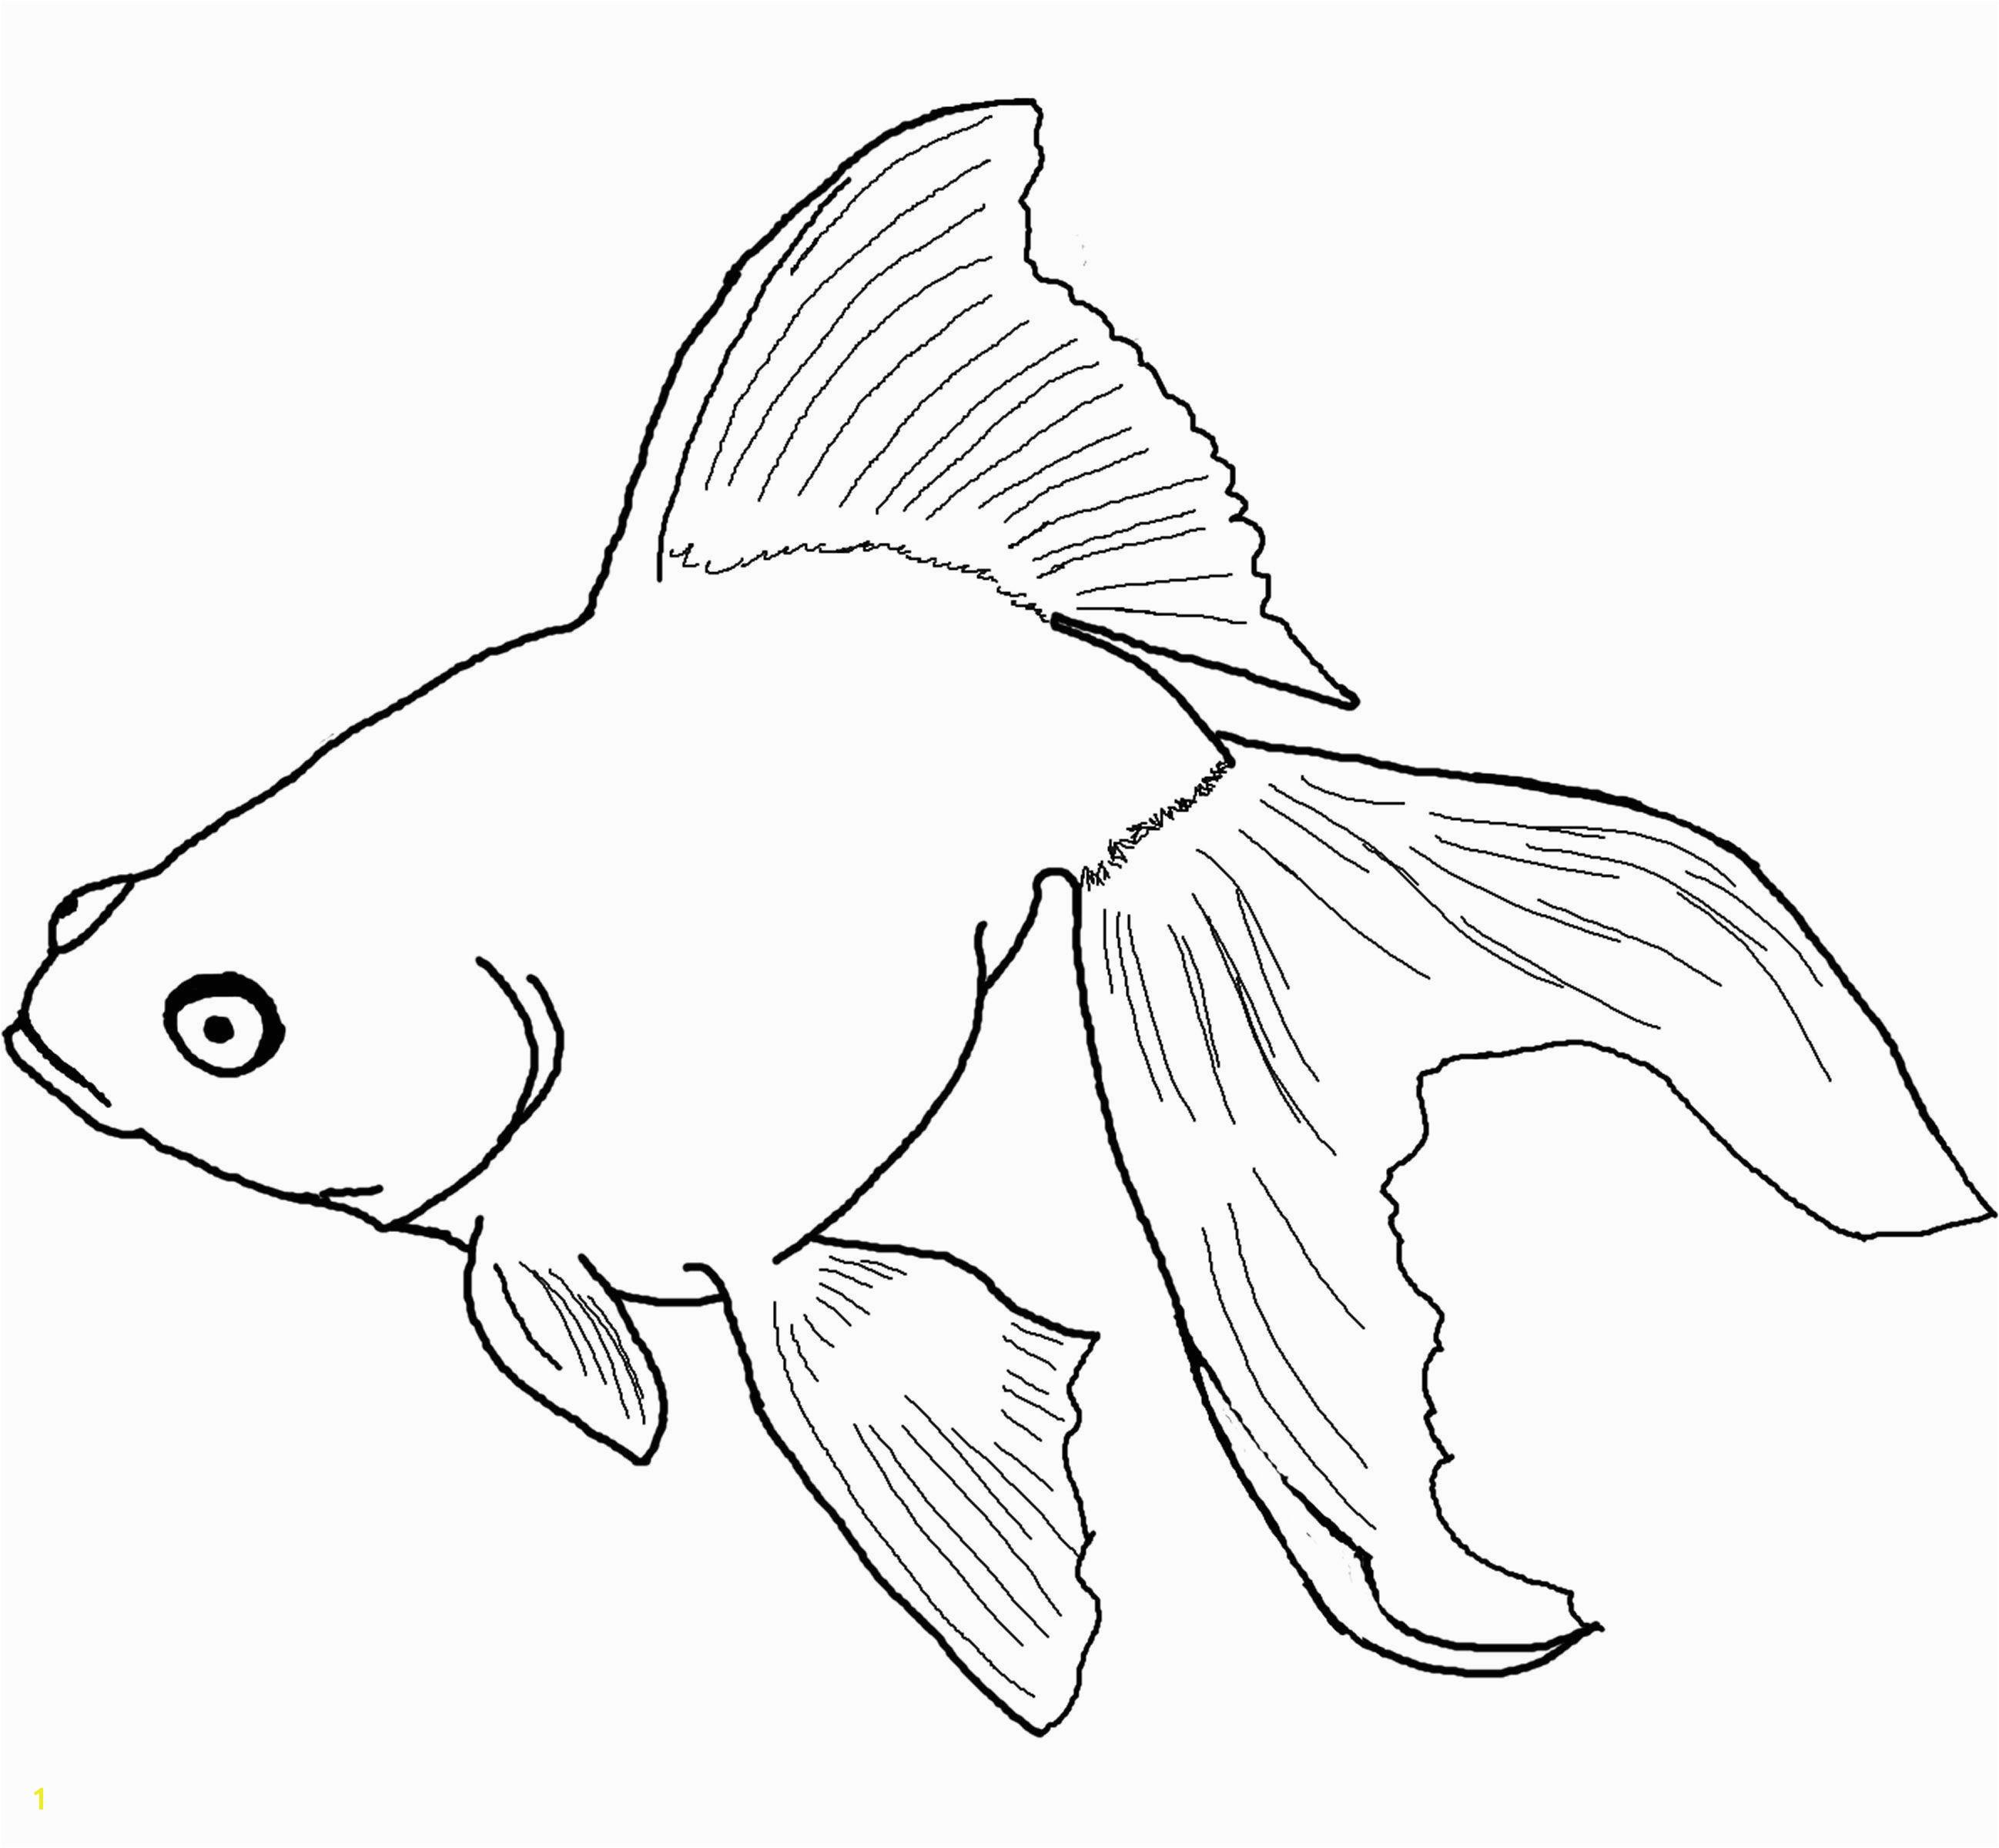 Betta Fish Coloring Pages Betta Fish Coloring Pages New Fish Coloring Pages for Adults New